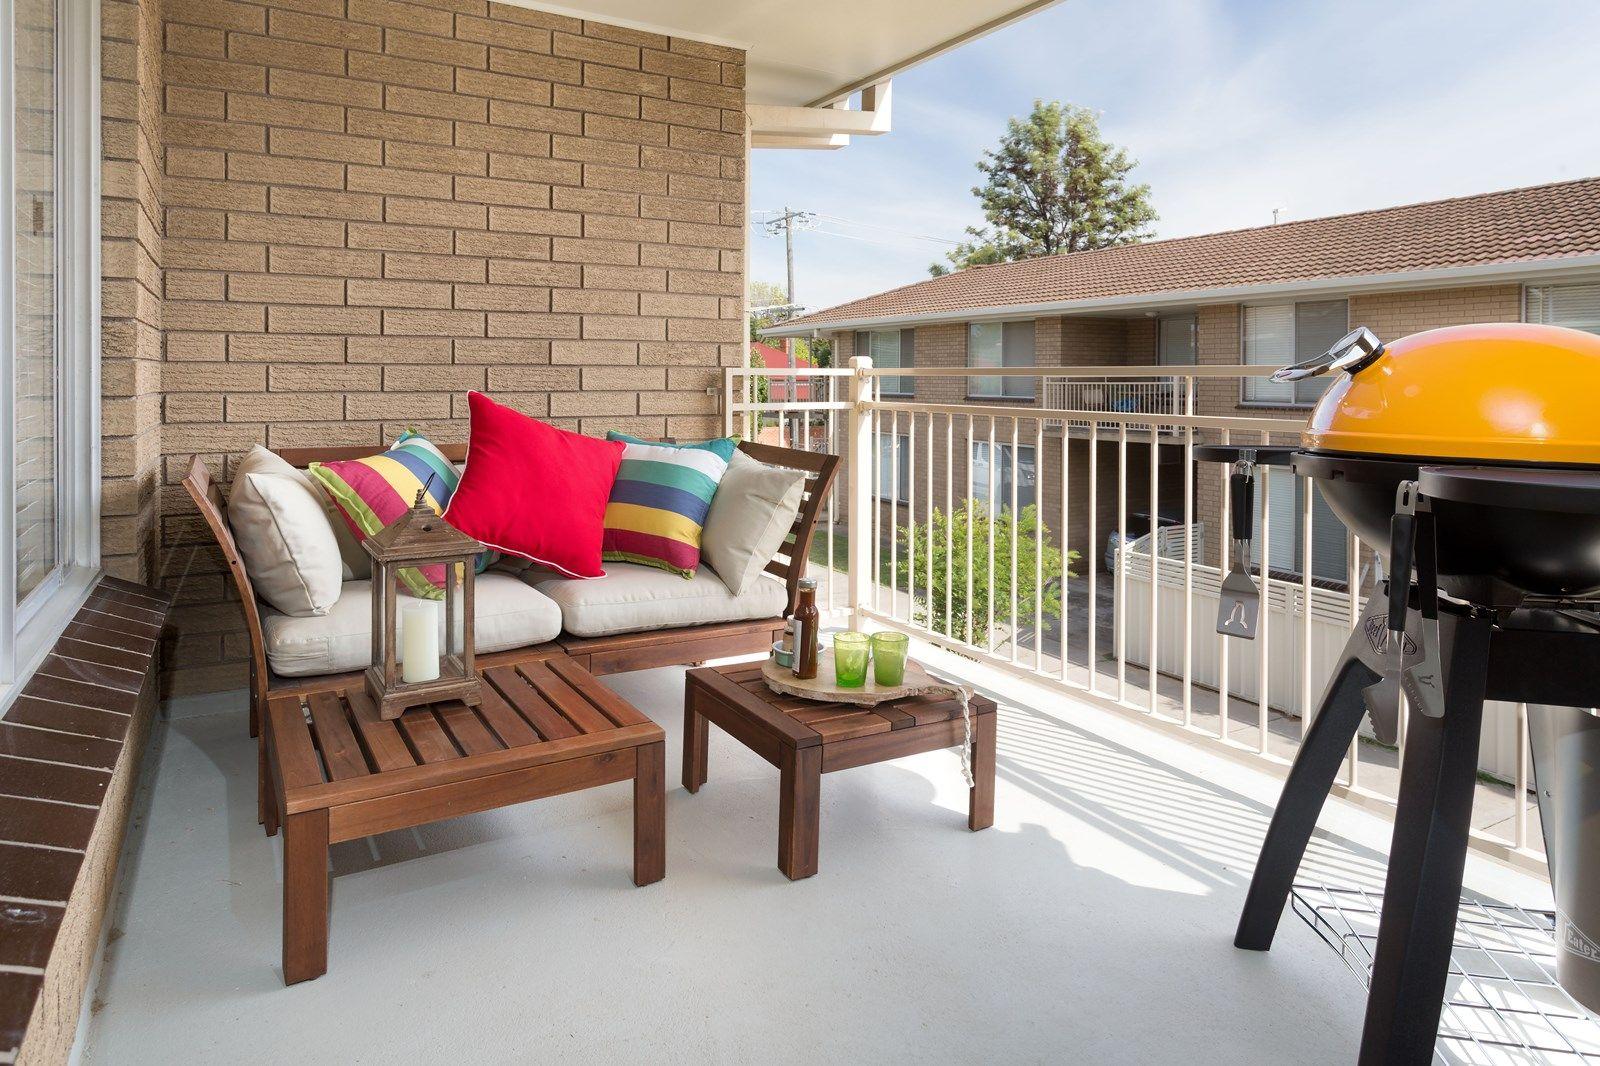 14/436 Macauley Street, Albury NSW 2640, Image 1